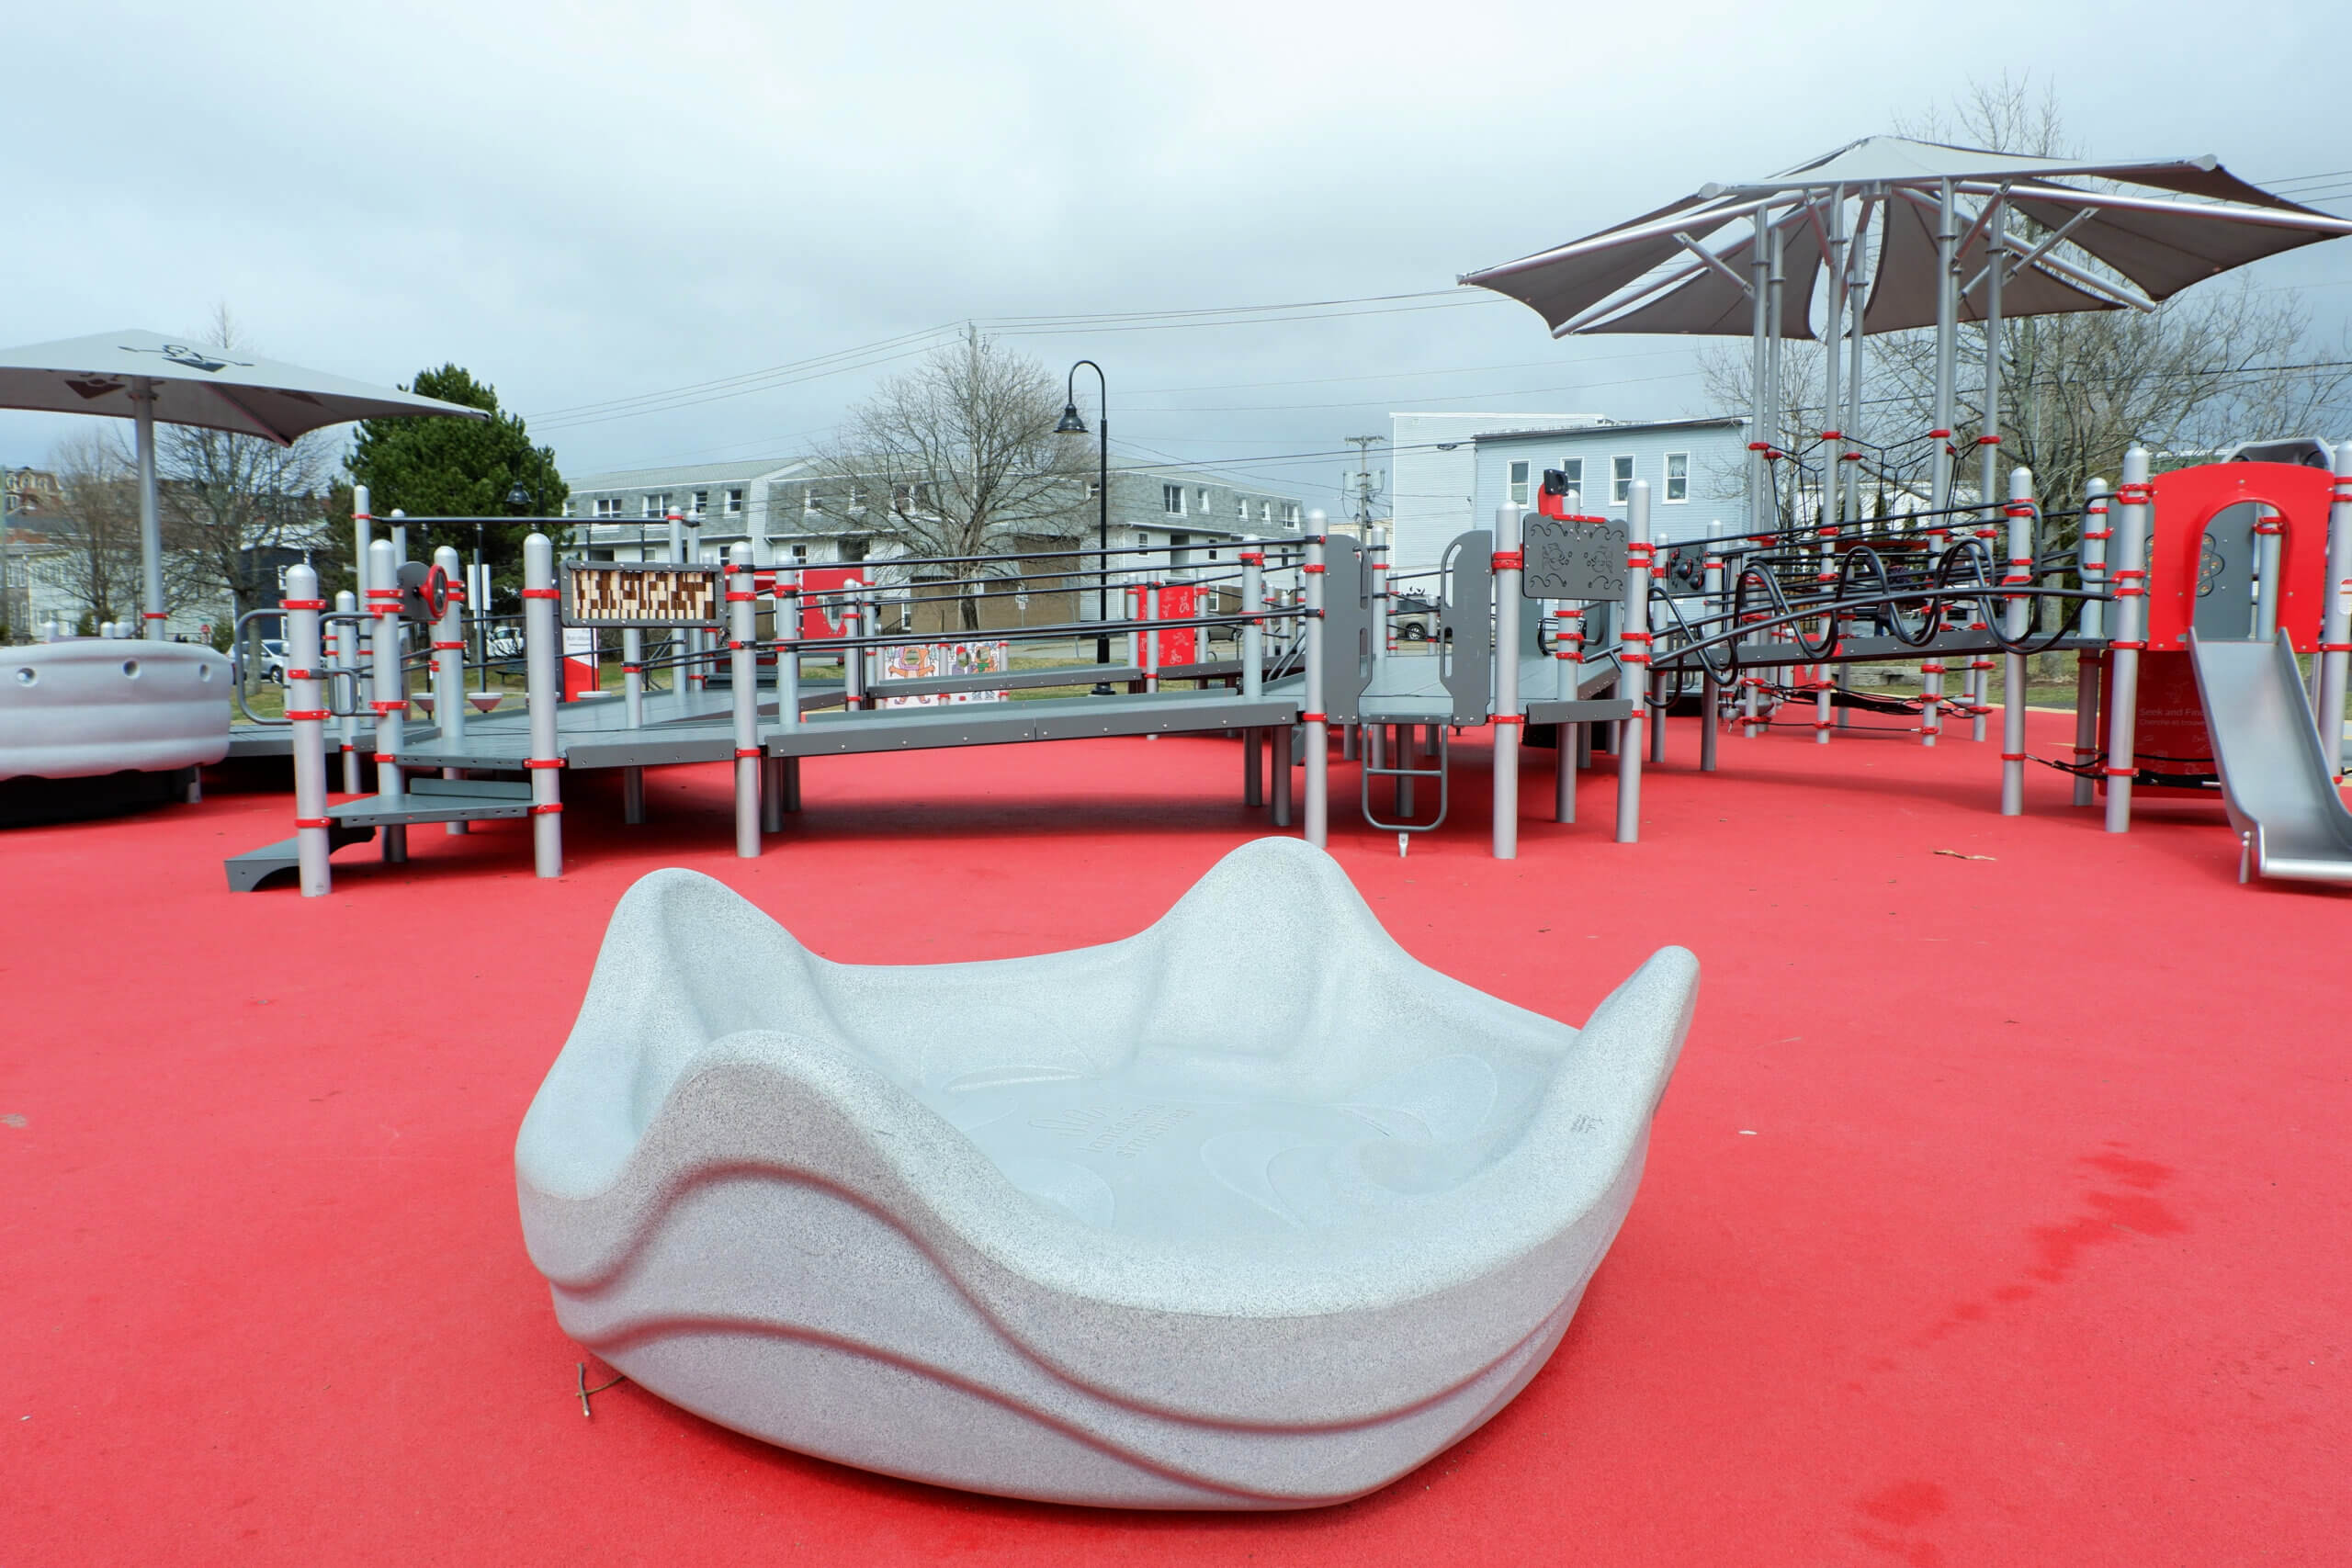 saint john rainbow park accessible inclusive playground south end city pickle planet